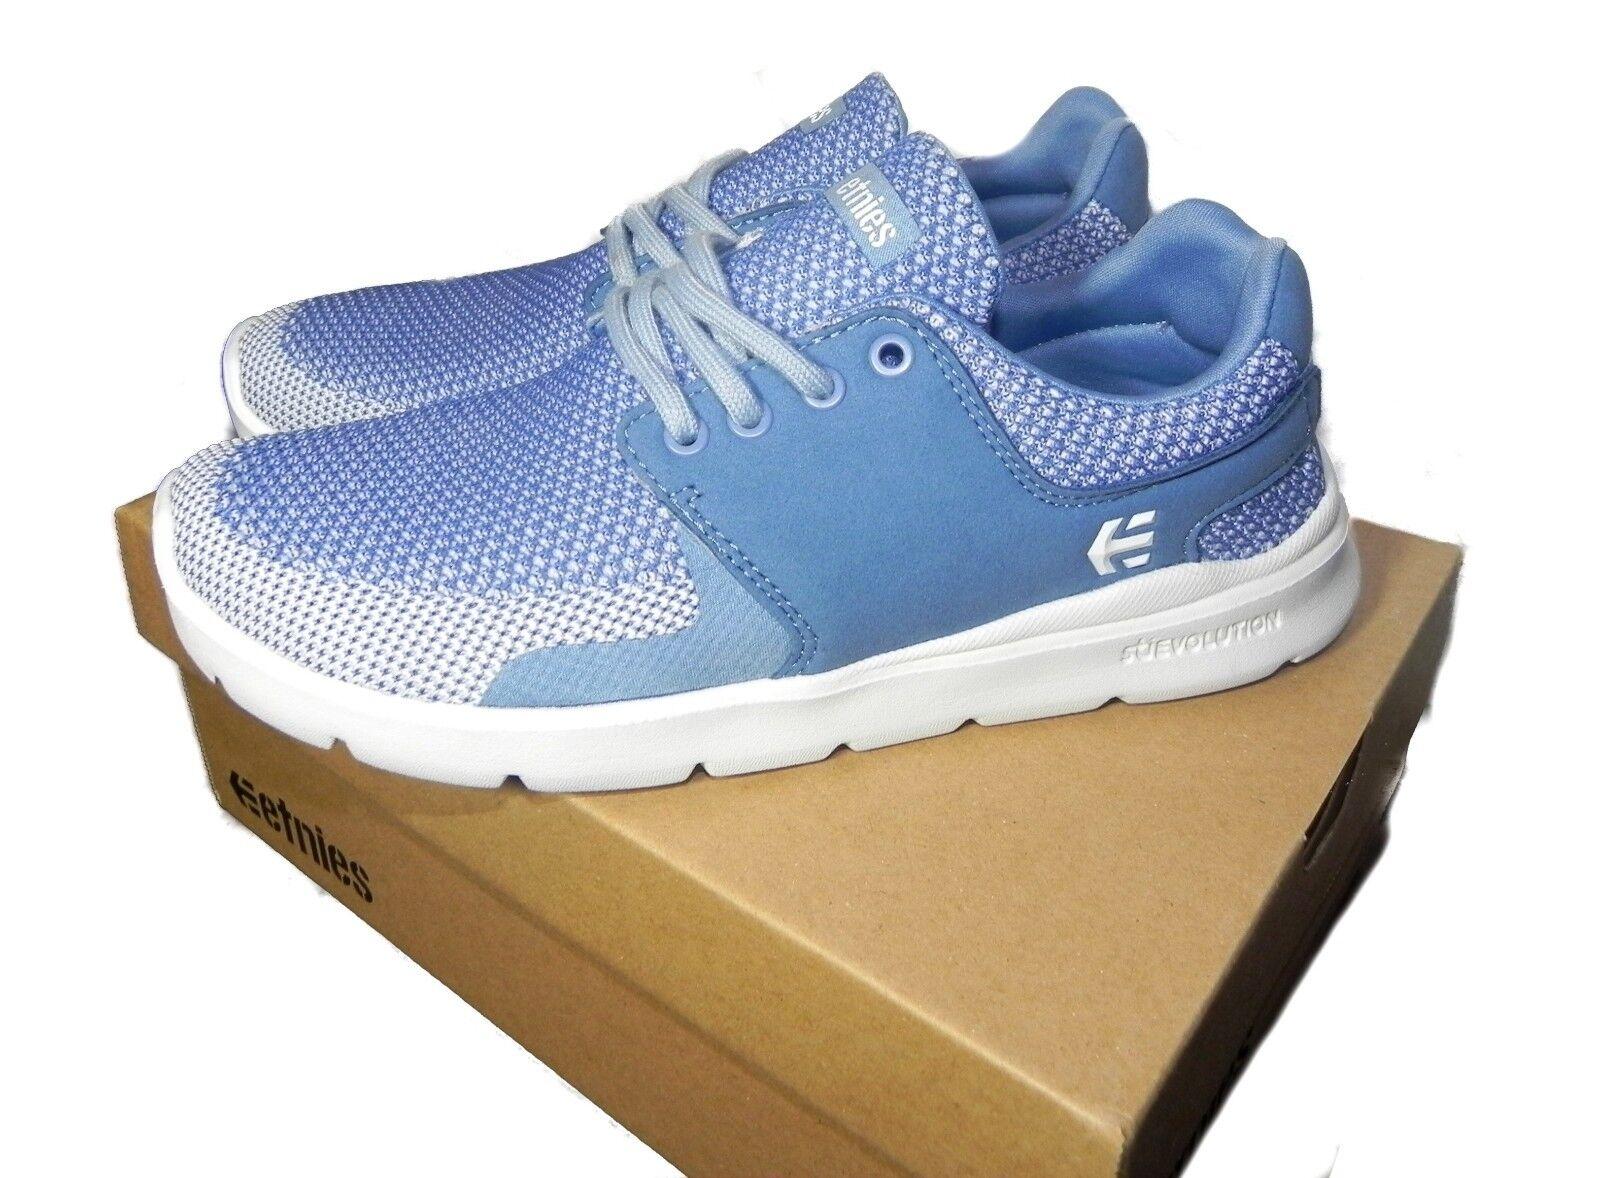 Etnies Damenschuhe Scout XT Yarn Bomb Sneaker Blau Größe 8 Brand New With Box80